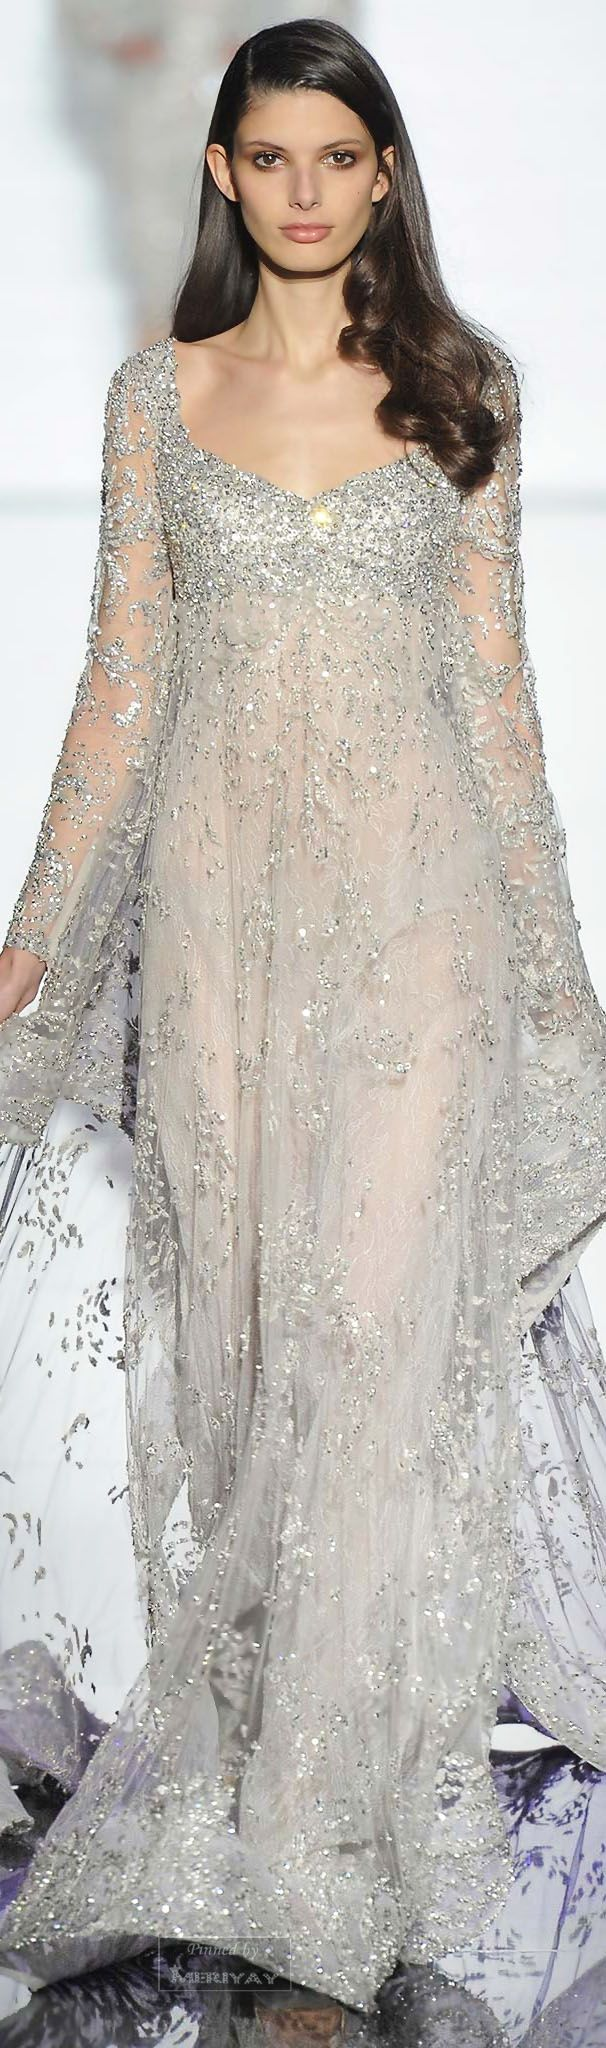 Zuhair Murad.Spring 2015 Couture ..... (2015/10/03)